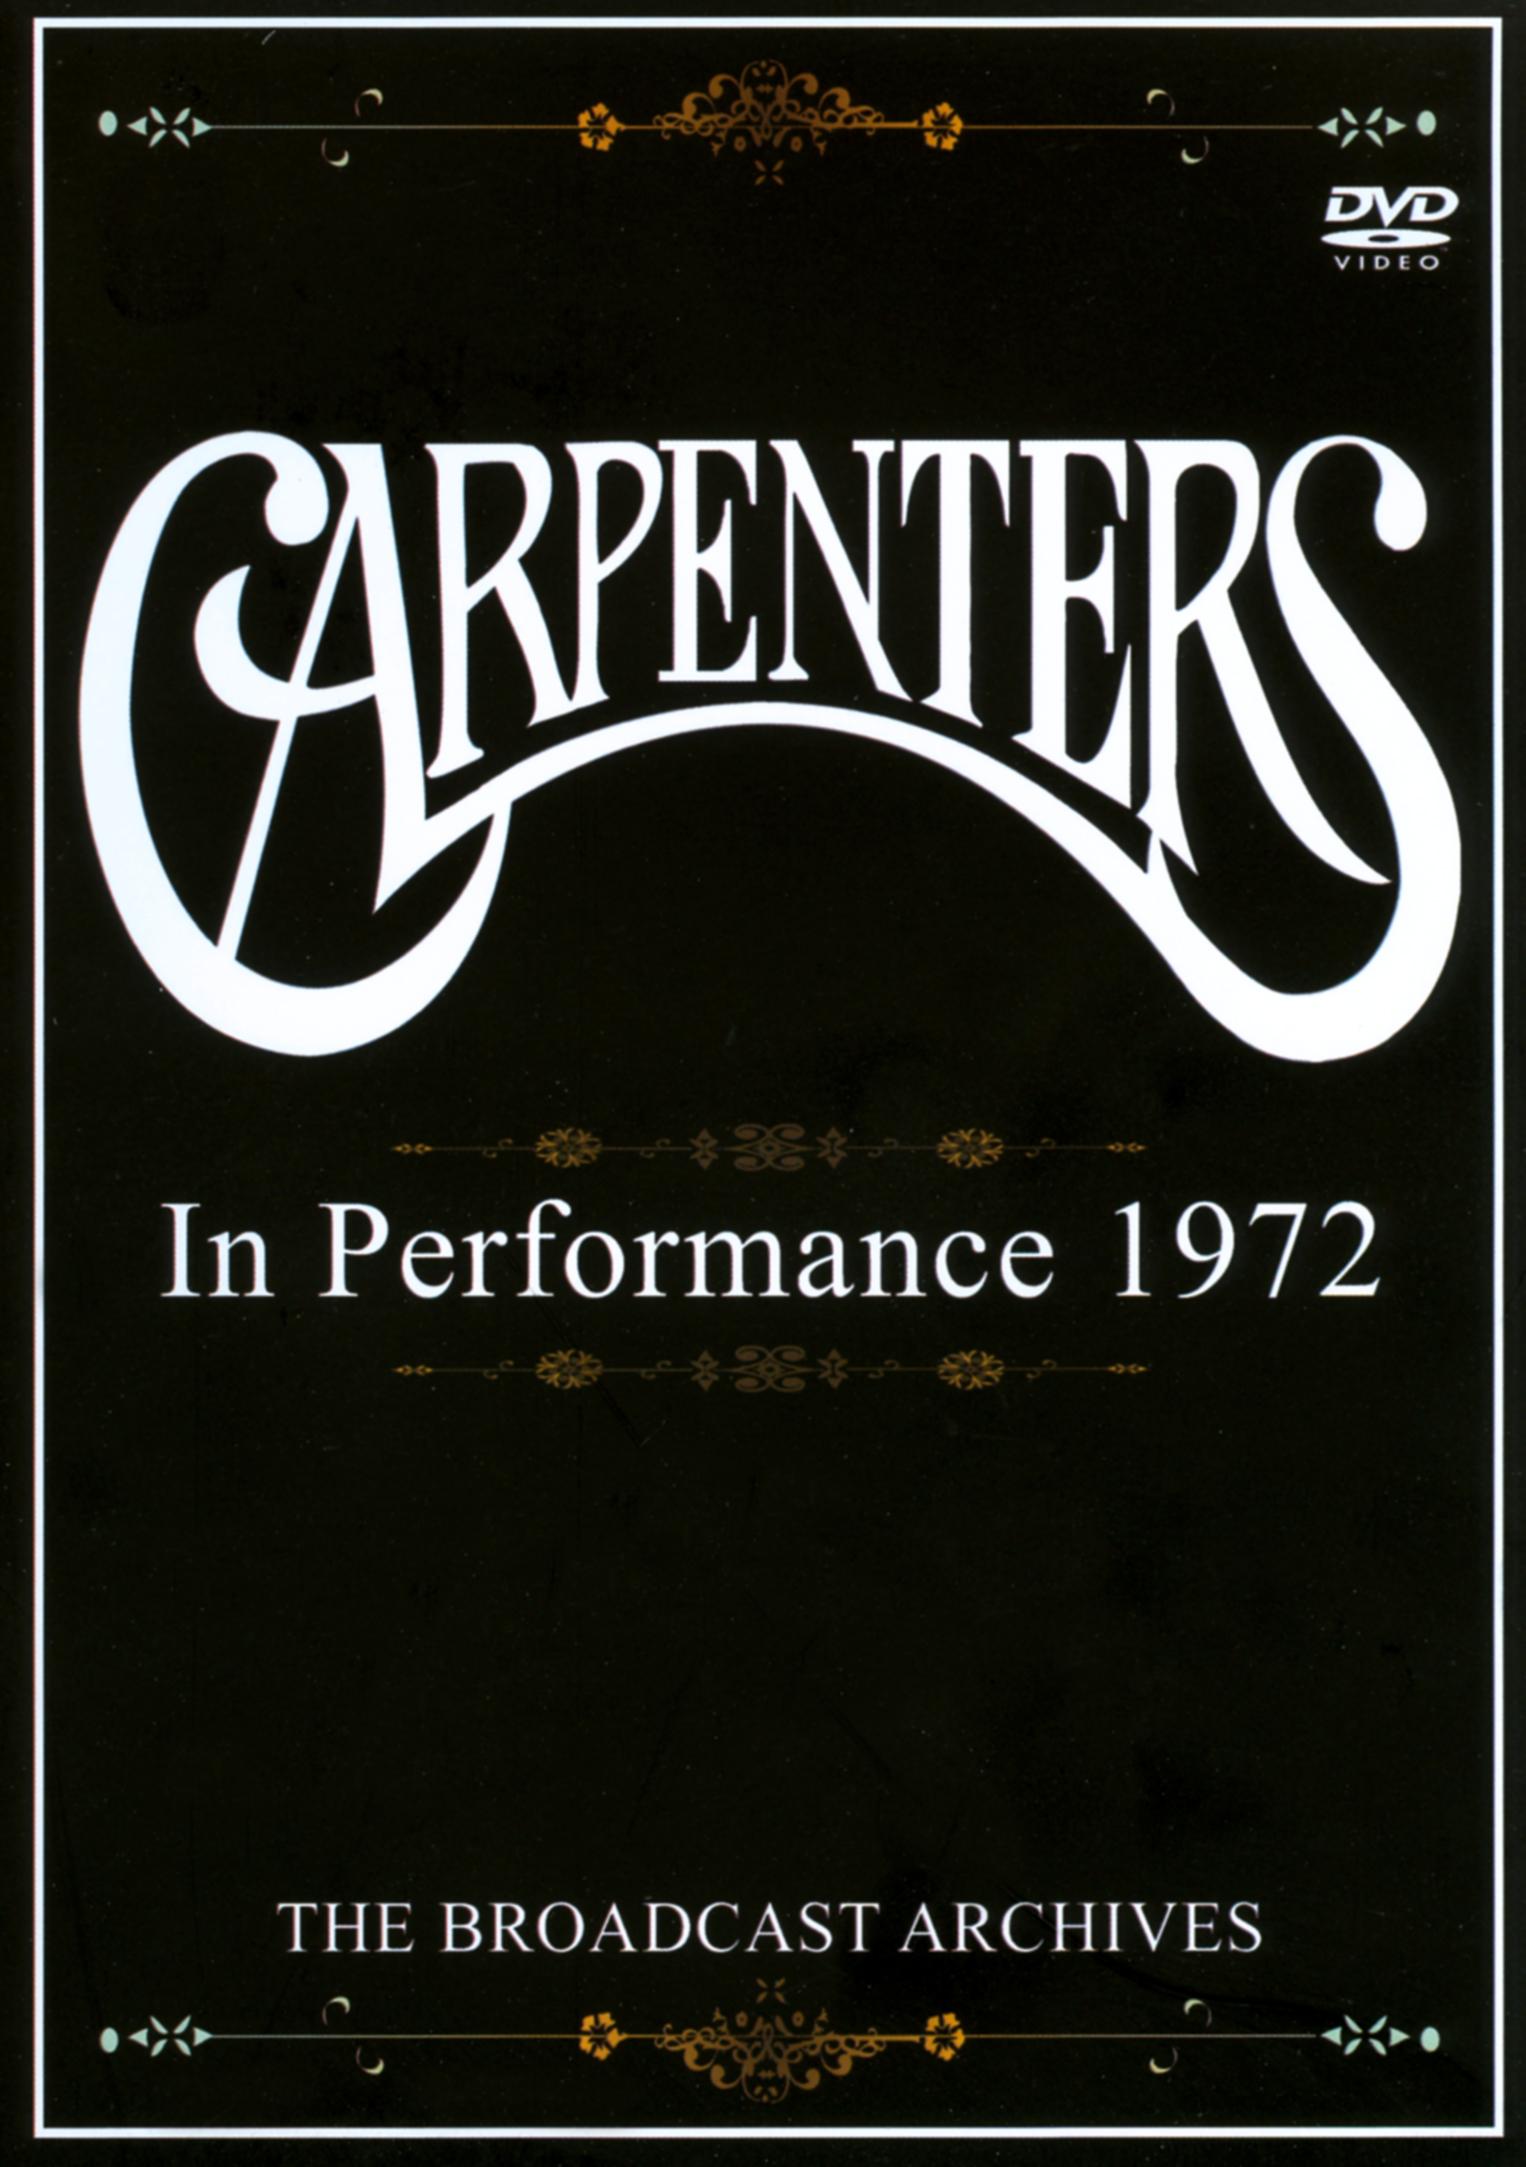 Carpenters: In Performance 1972